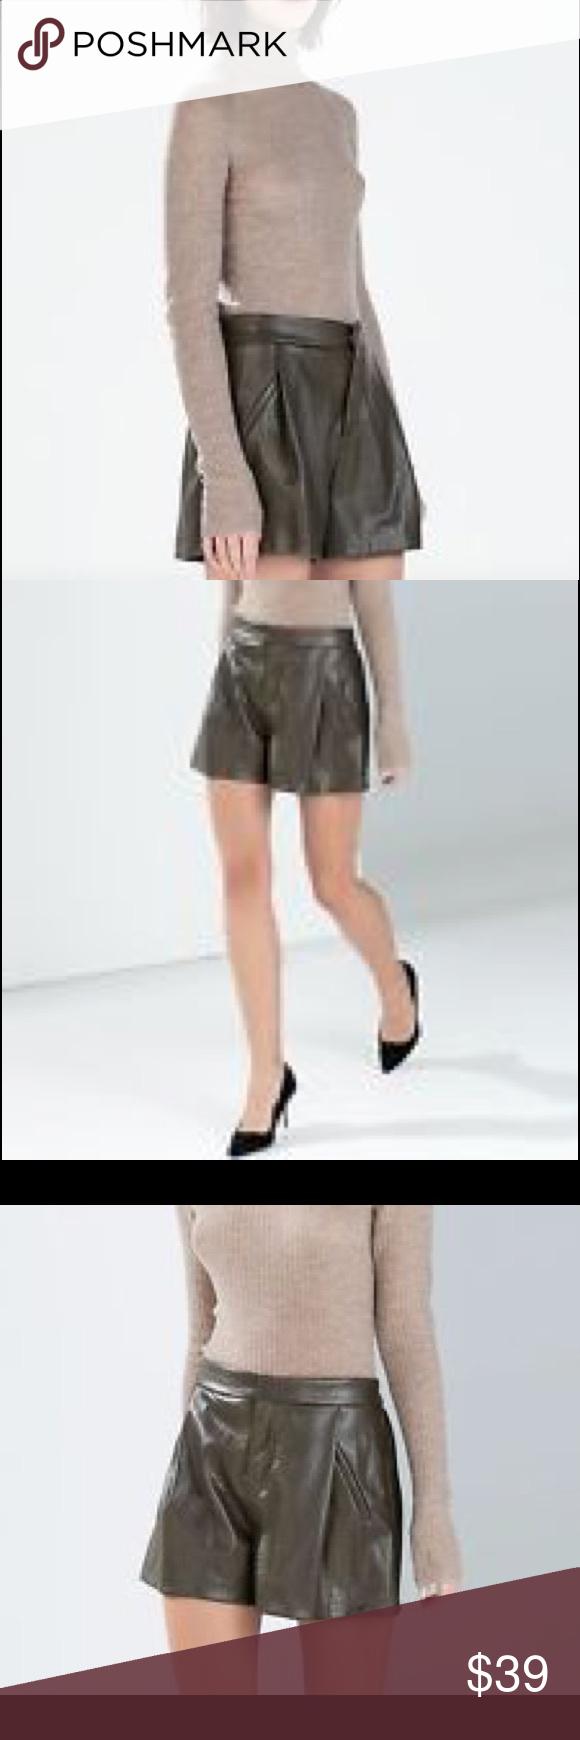 f3c62162 ZARA DARK GREEN FAUX LEATHER SNAKESKIN SHORTS Gorgeous dark sage green faux  leather shorts!